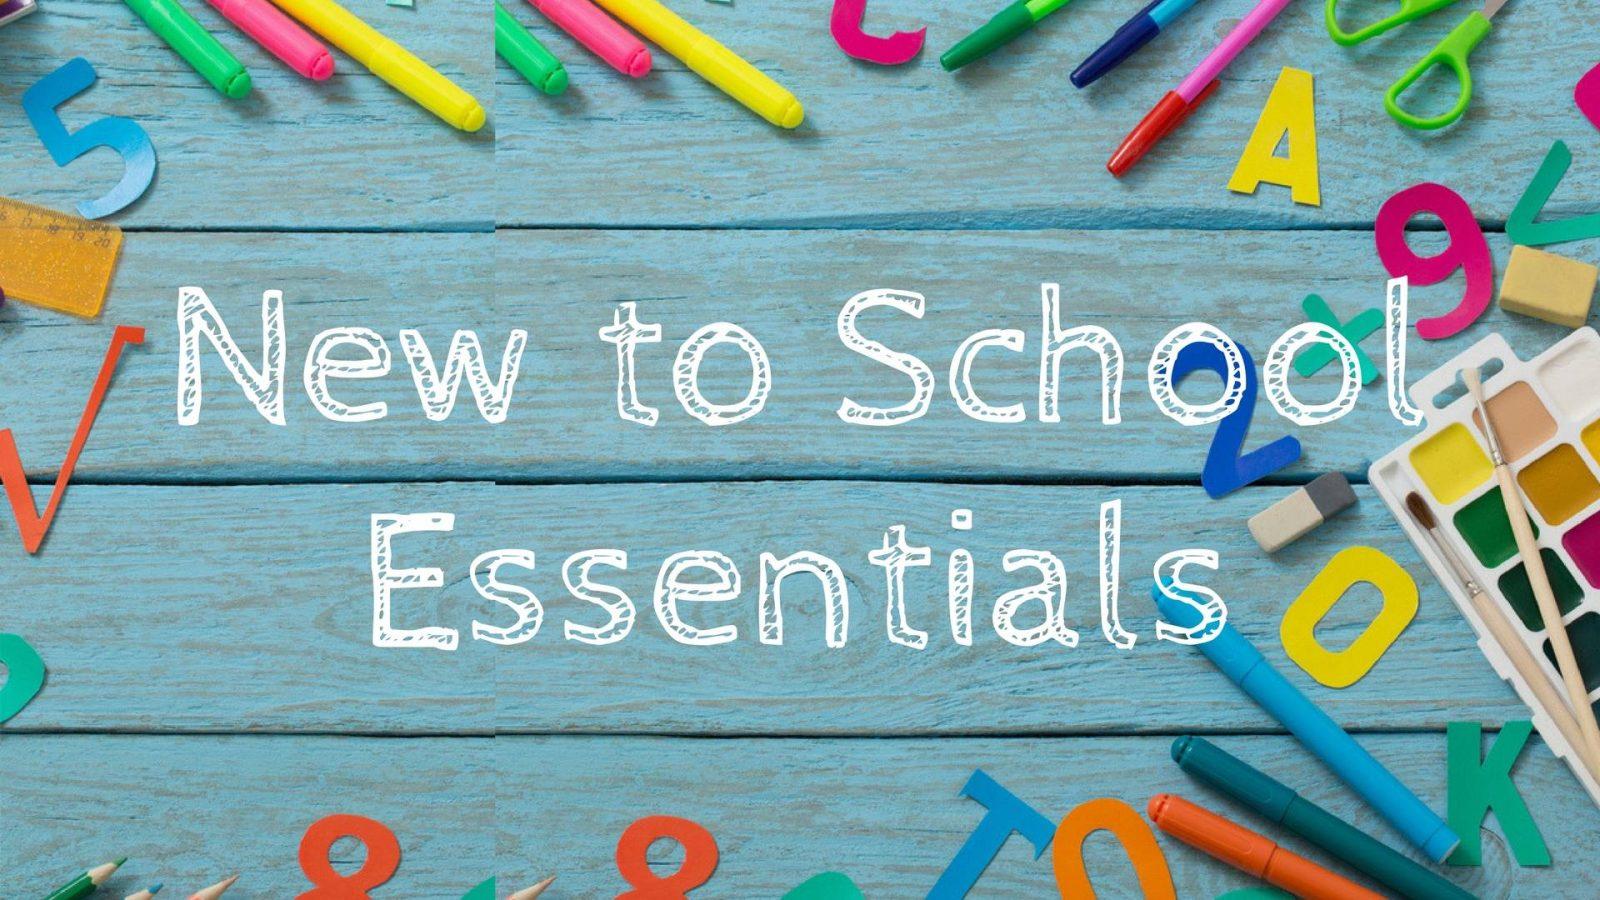 New to school essentials